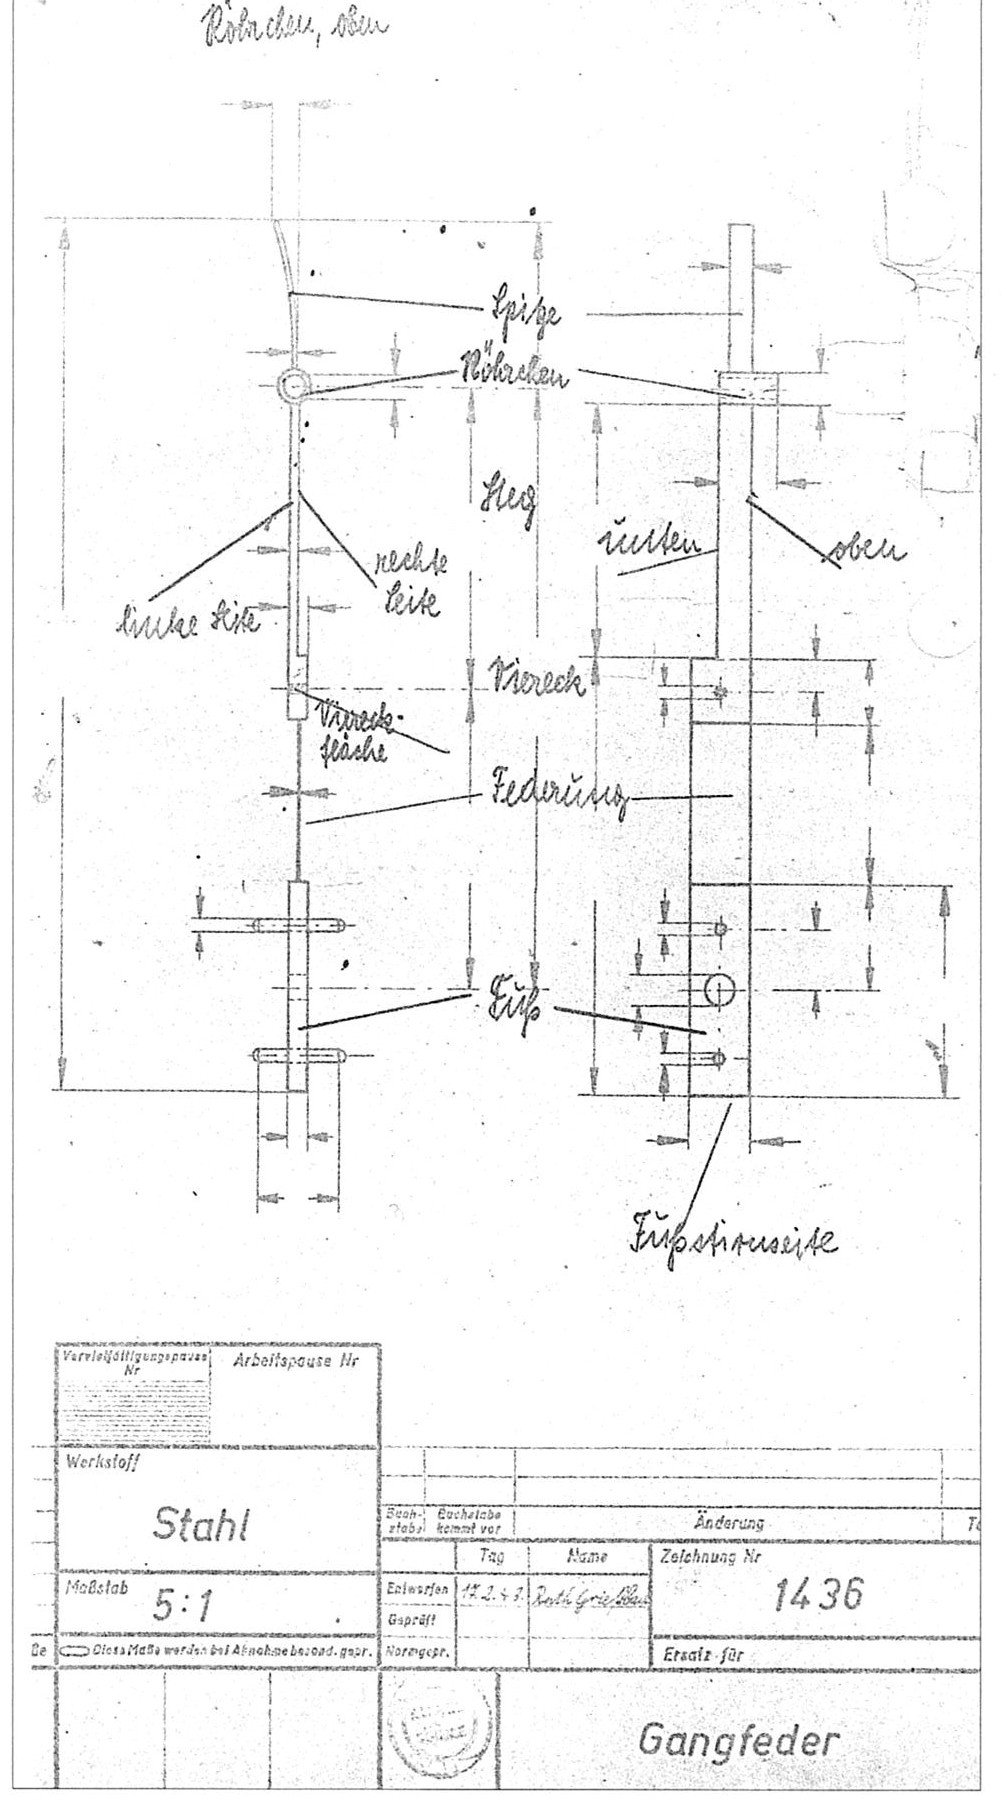 Copy of Einheitschronometer drwg